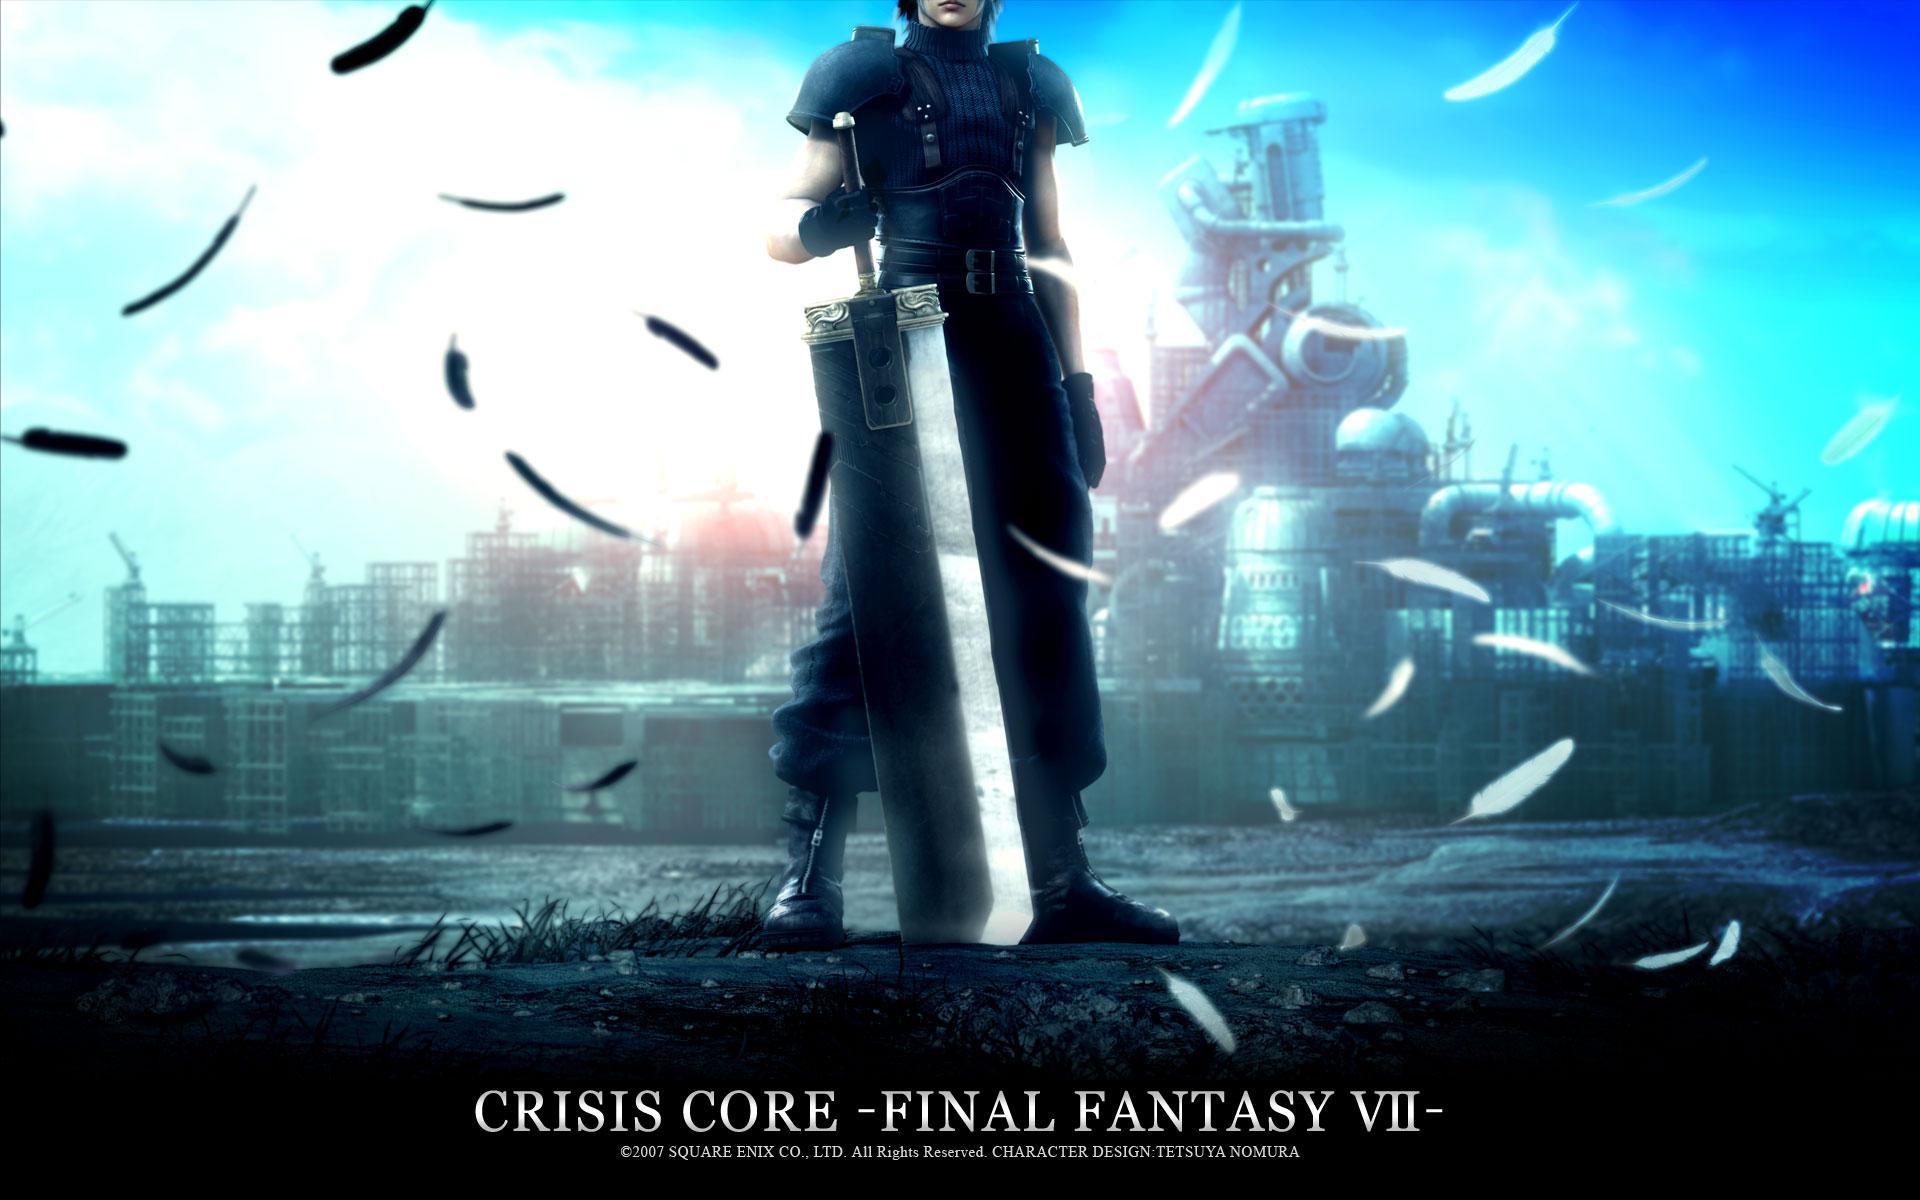 crisis_core_final_fantasy_vii final_fantasy final_fantasy_vii zack_fair